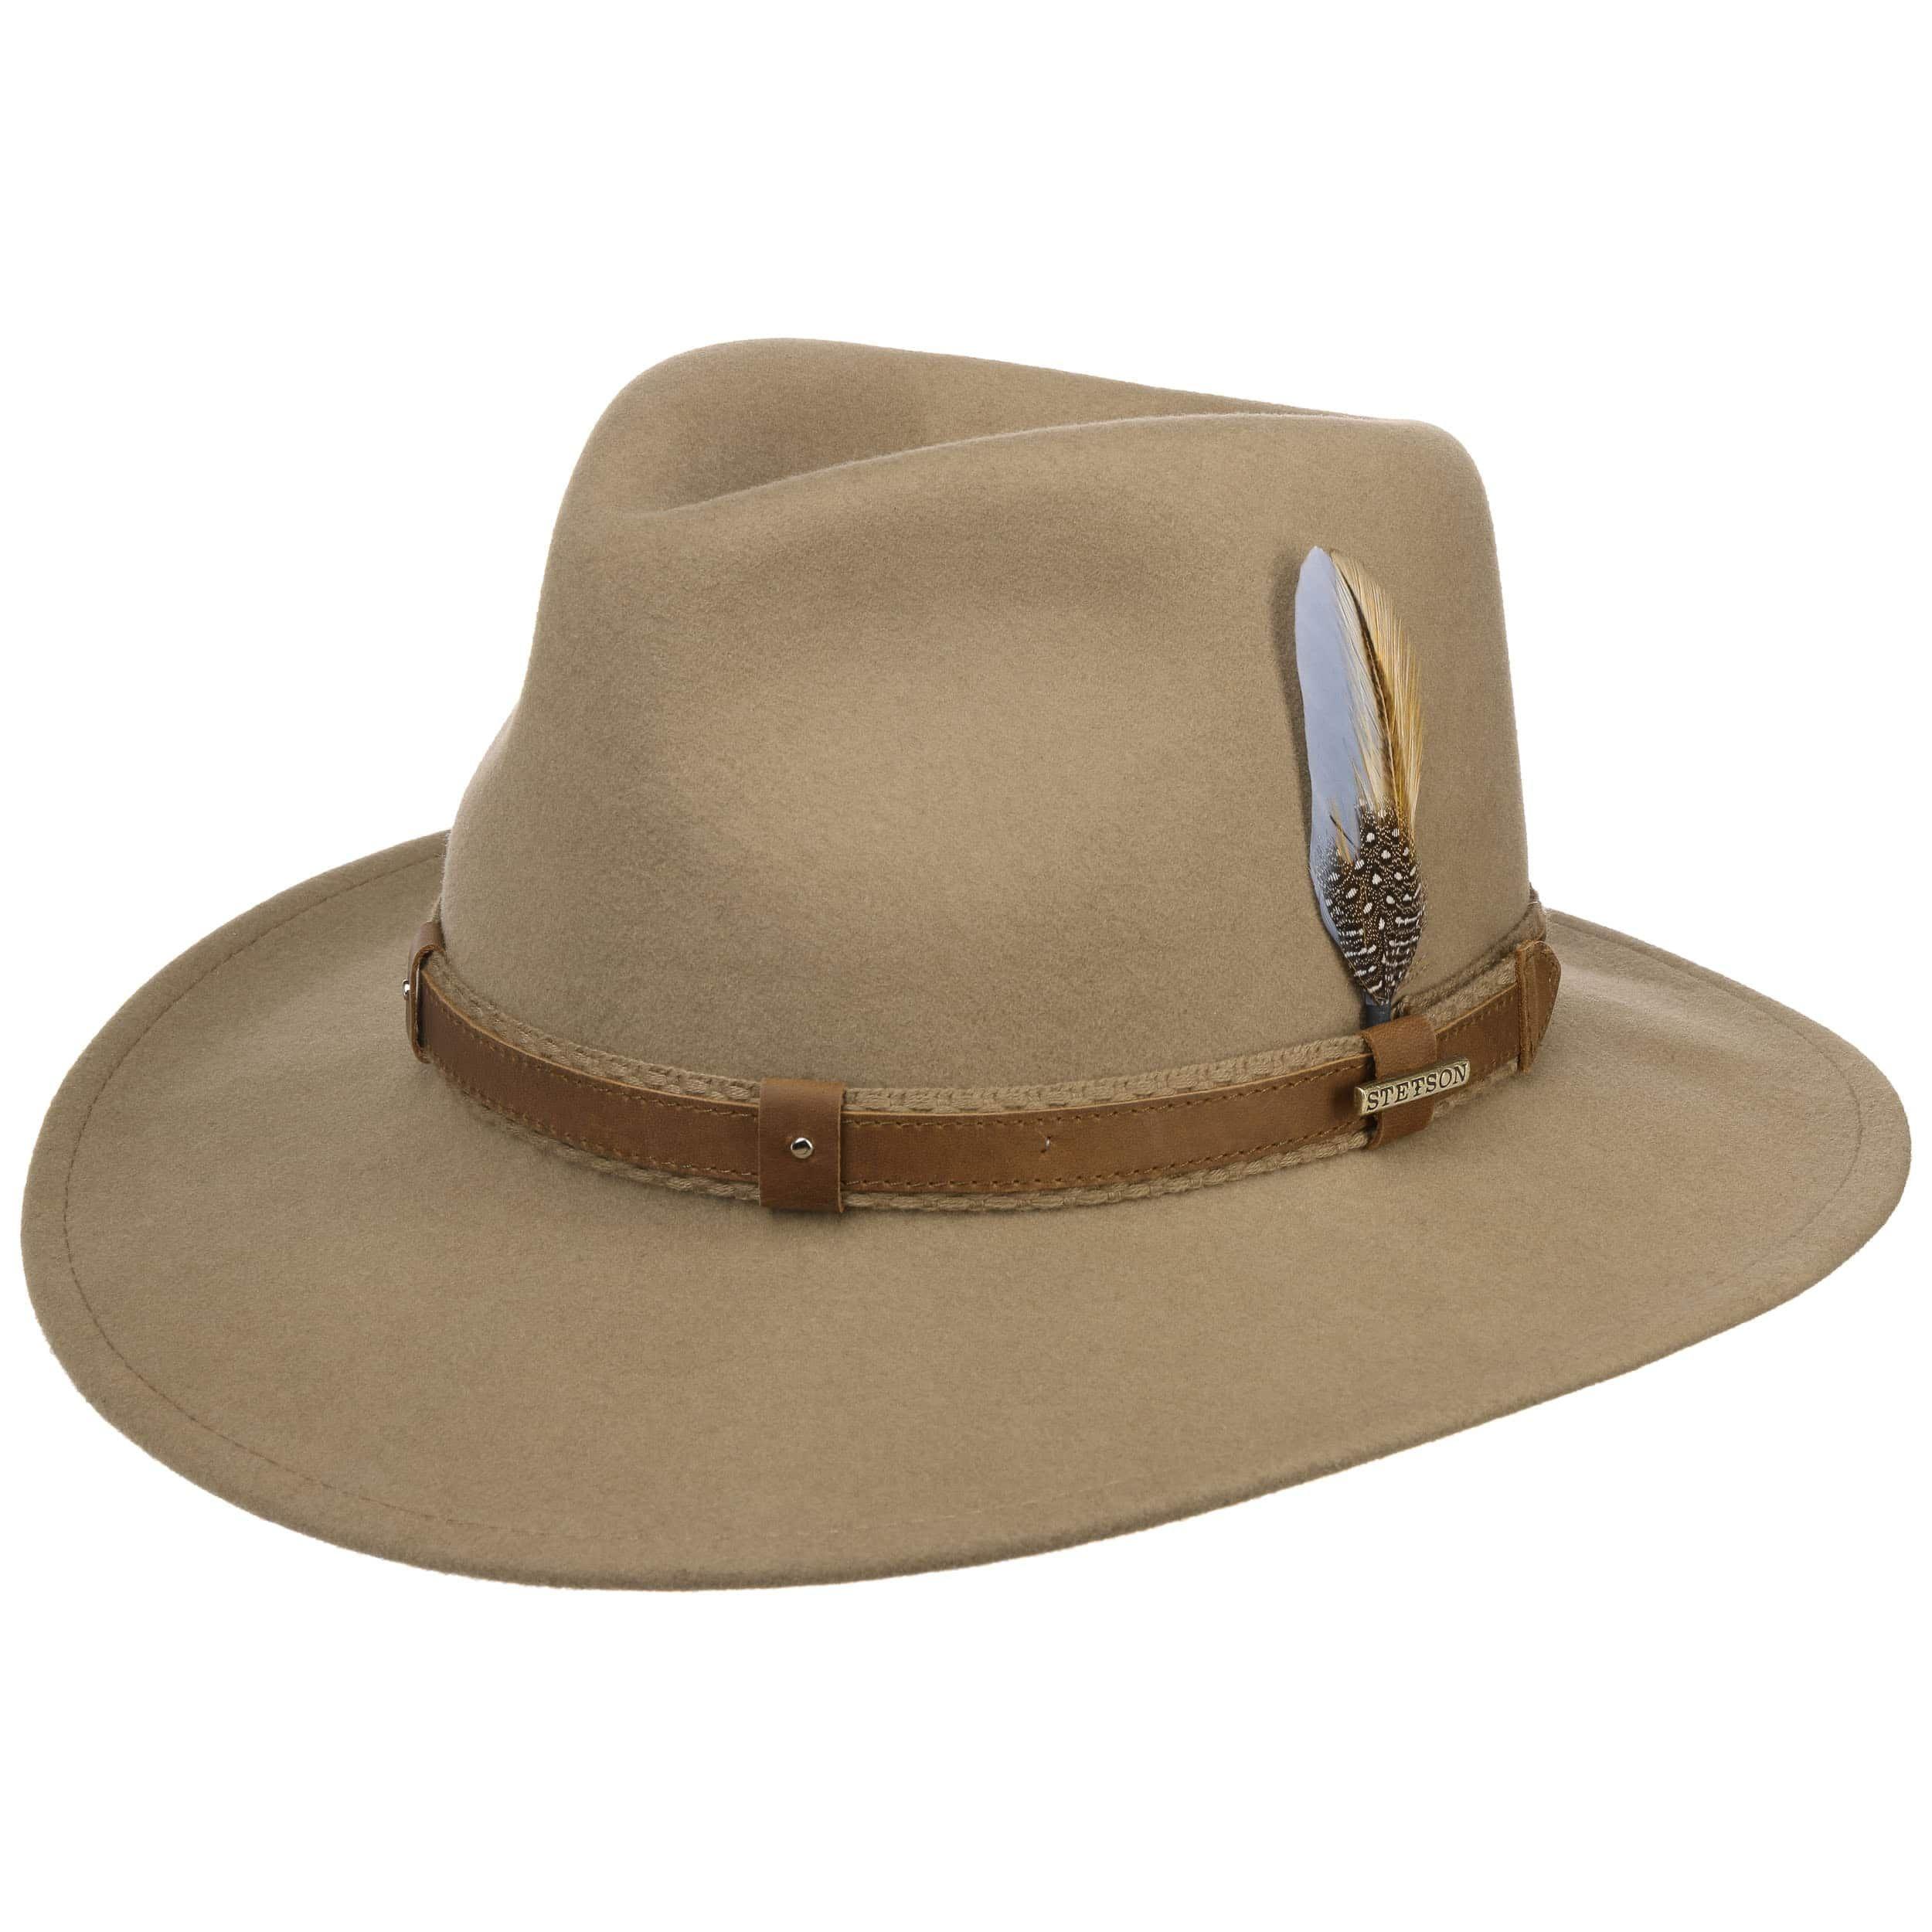 Carverton VitaFelt Wool Felt Hat beige